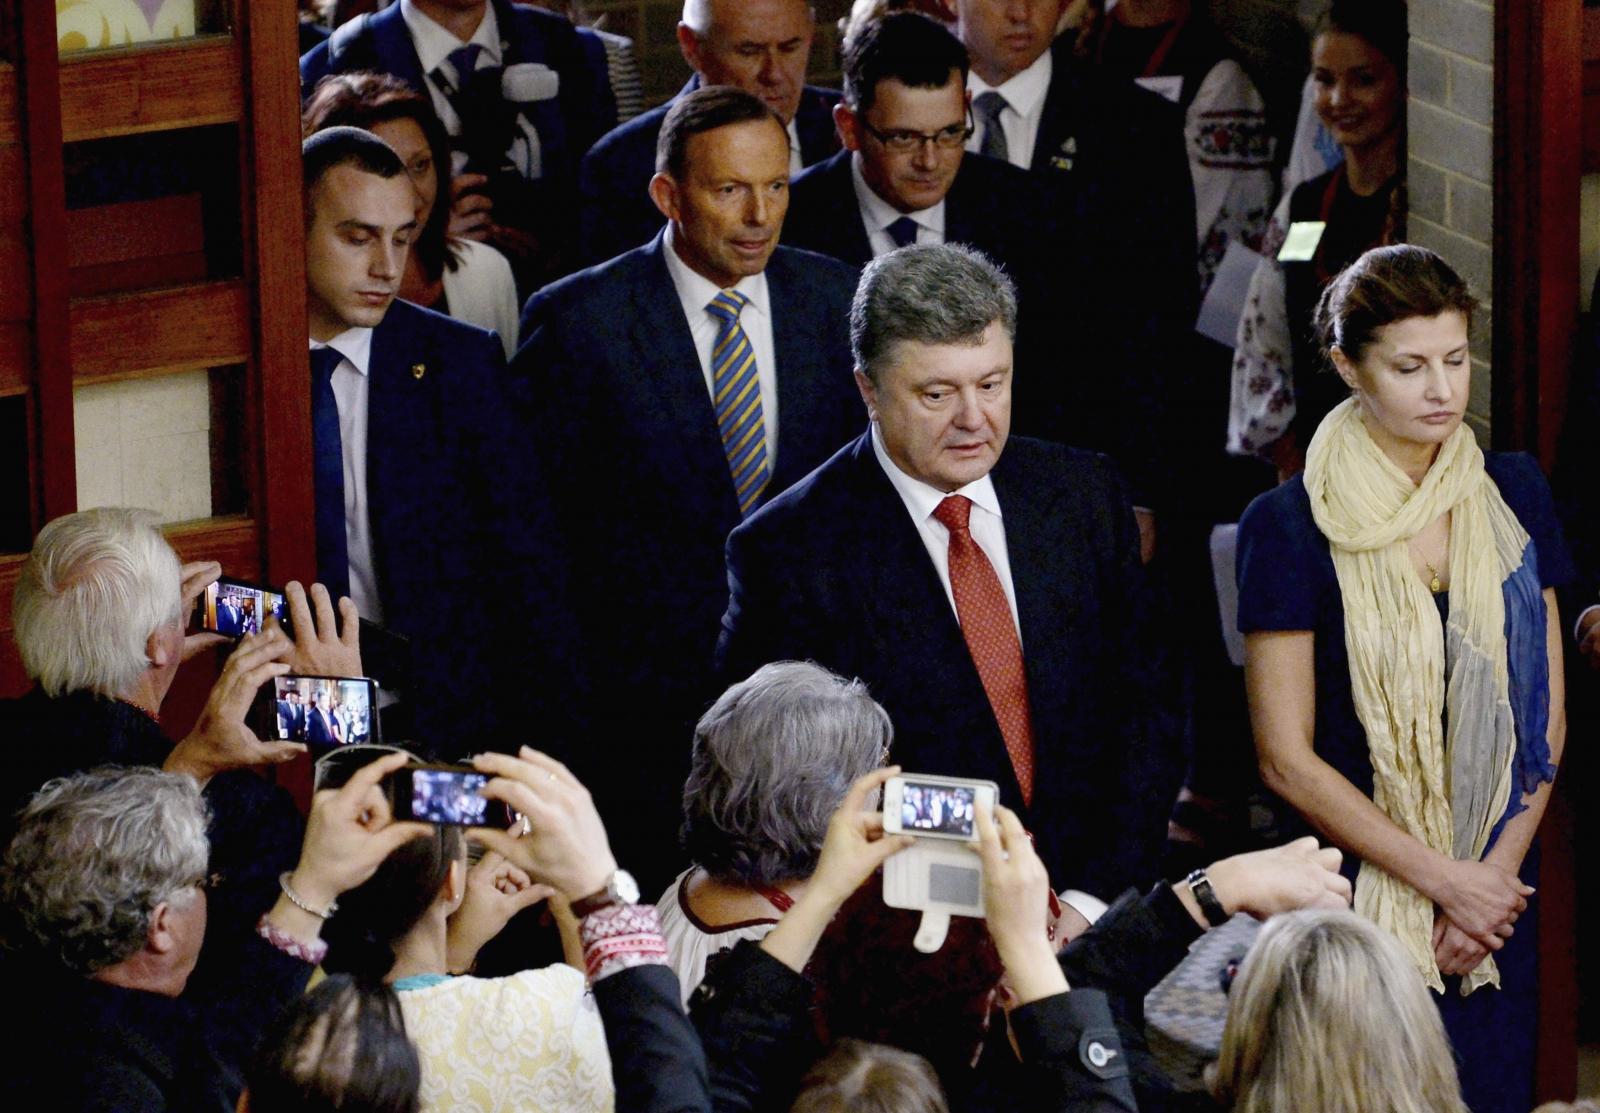 Australia could boost Ukrainian energy security with coal, uranium